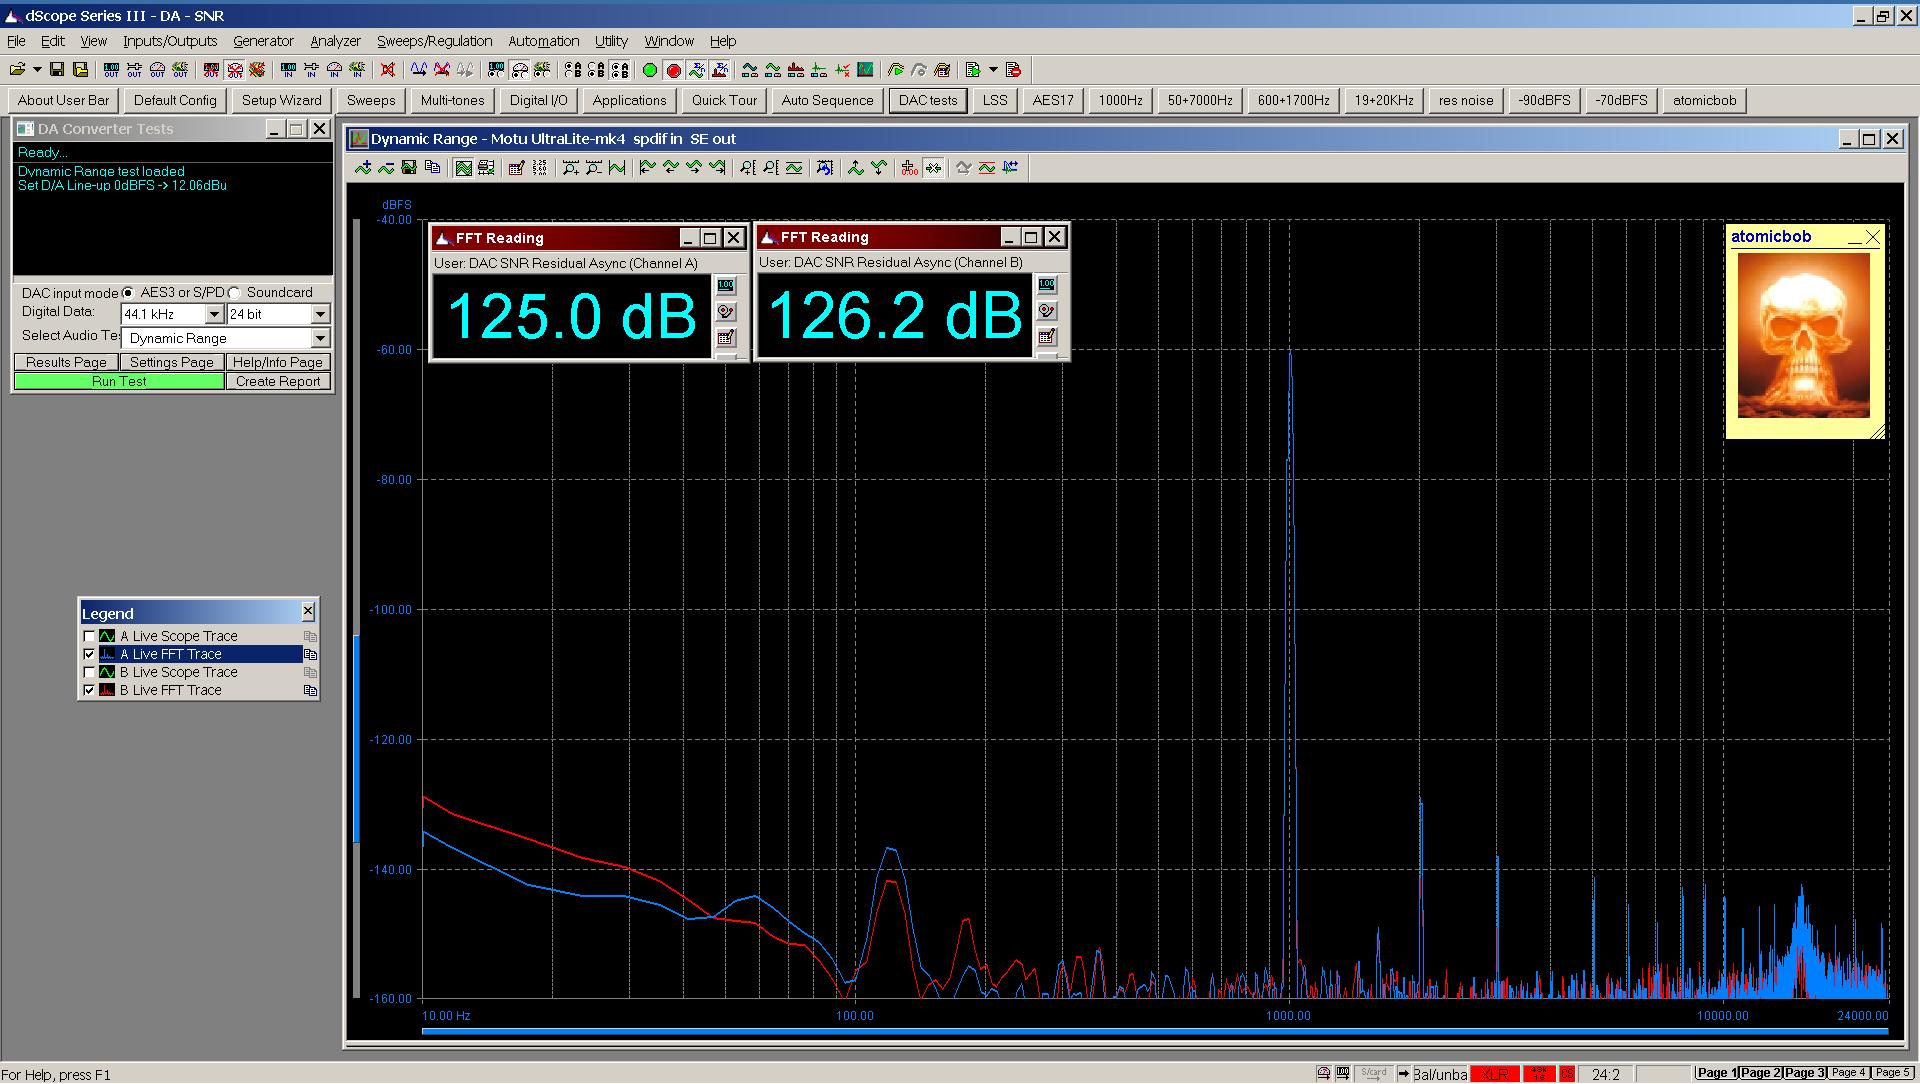 20200604 UltraLite-mk4 dynamic range FFT spdif SE.png